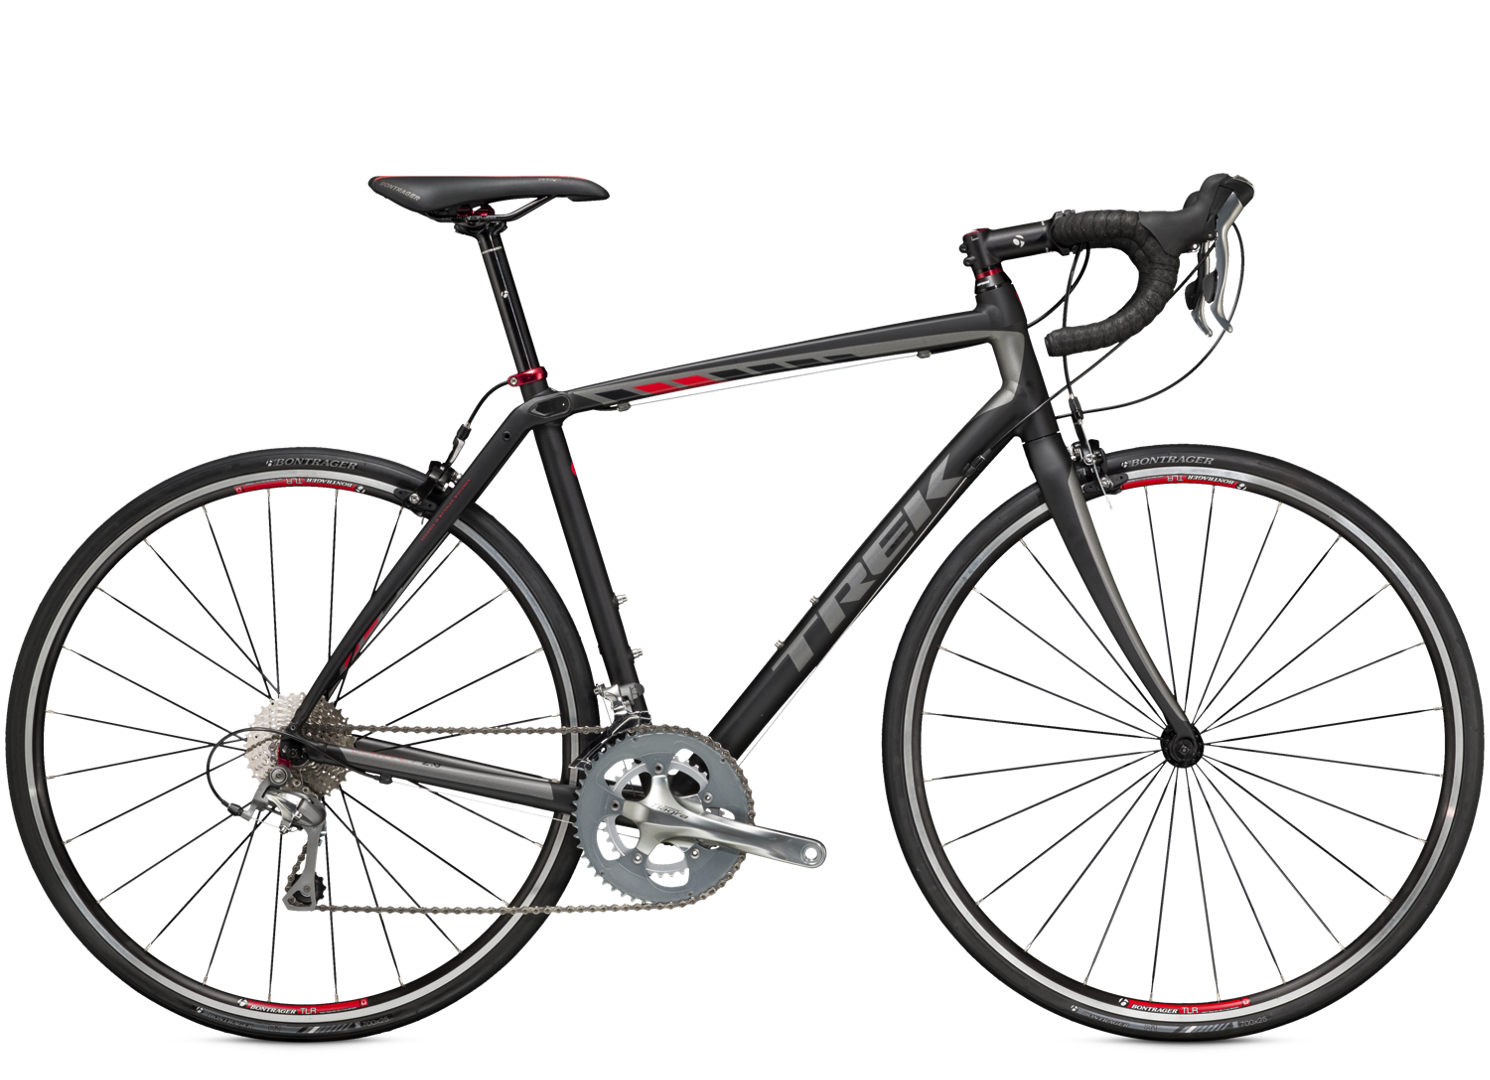 Bicycle Tune Up >> 2015 Domane 2.0 Compact - Bike Archive - Trek Bicycle